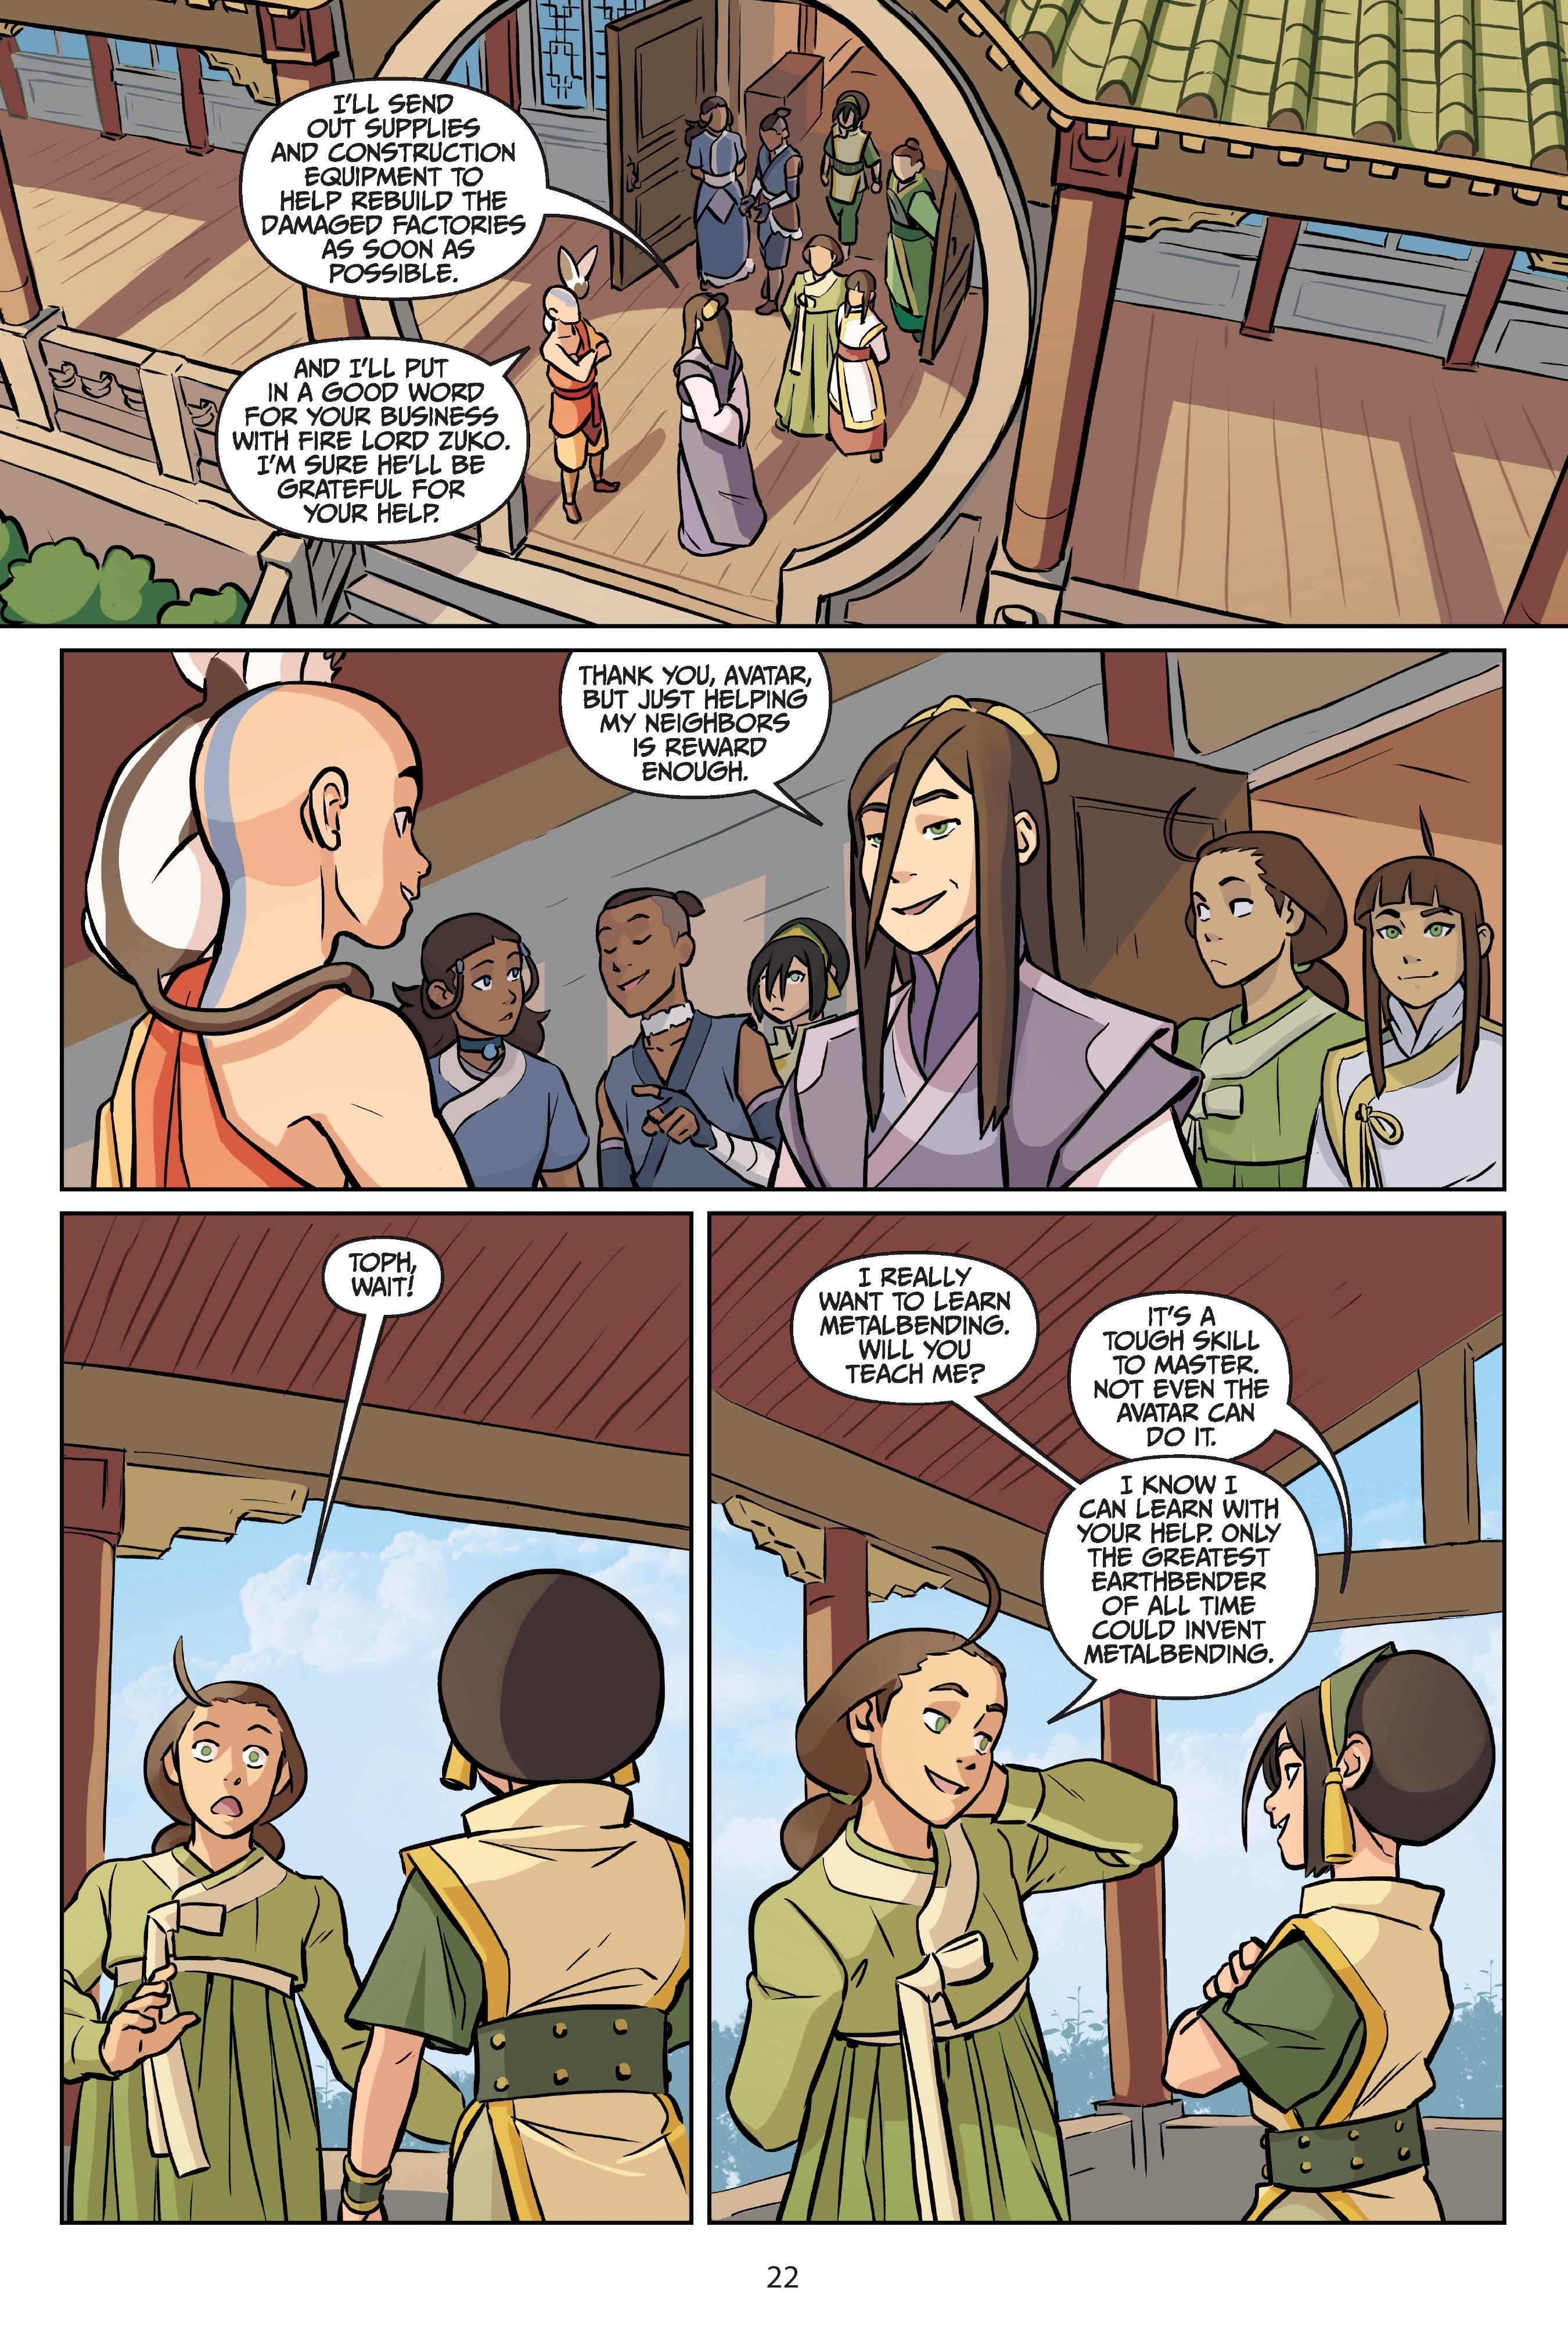 Nickelodeon Avatar: The Last Airbender - Imbalance TPB_2 Page 22